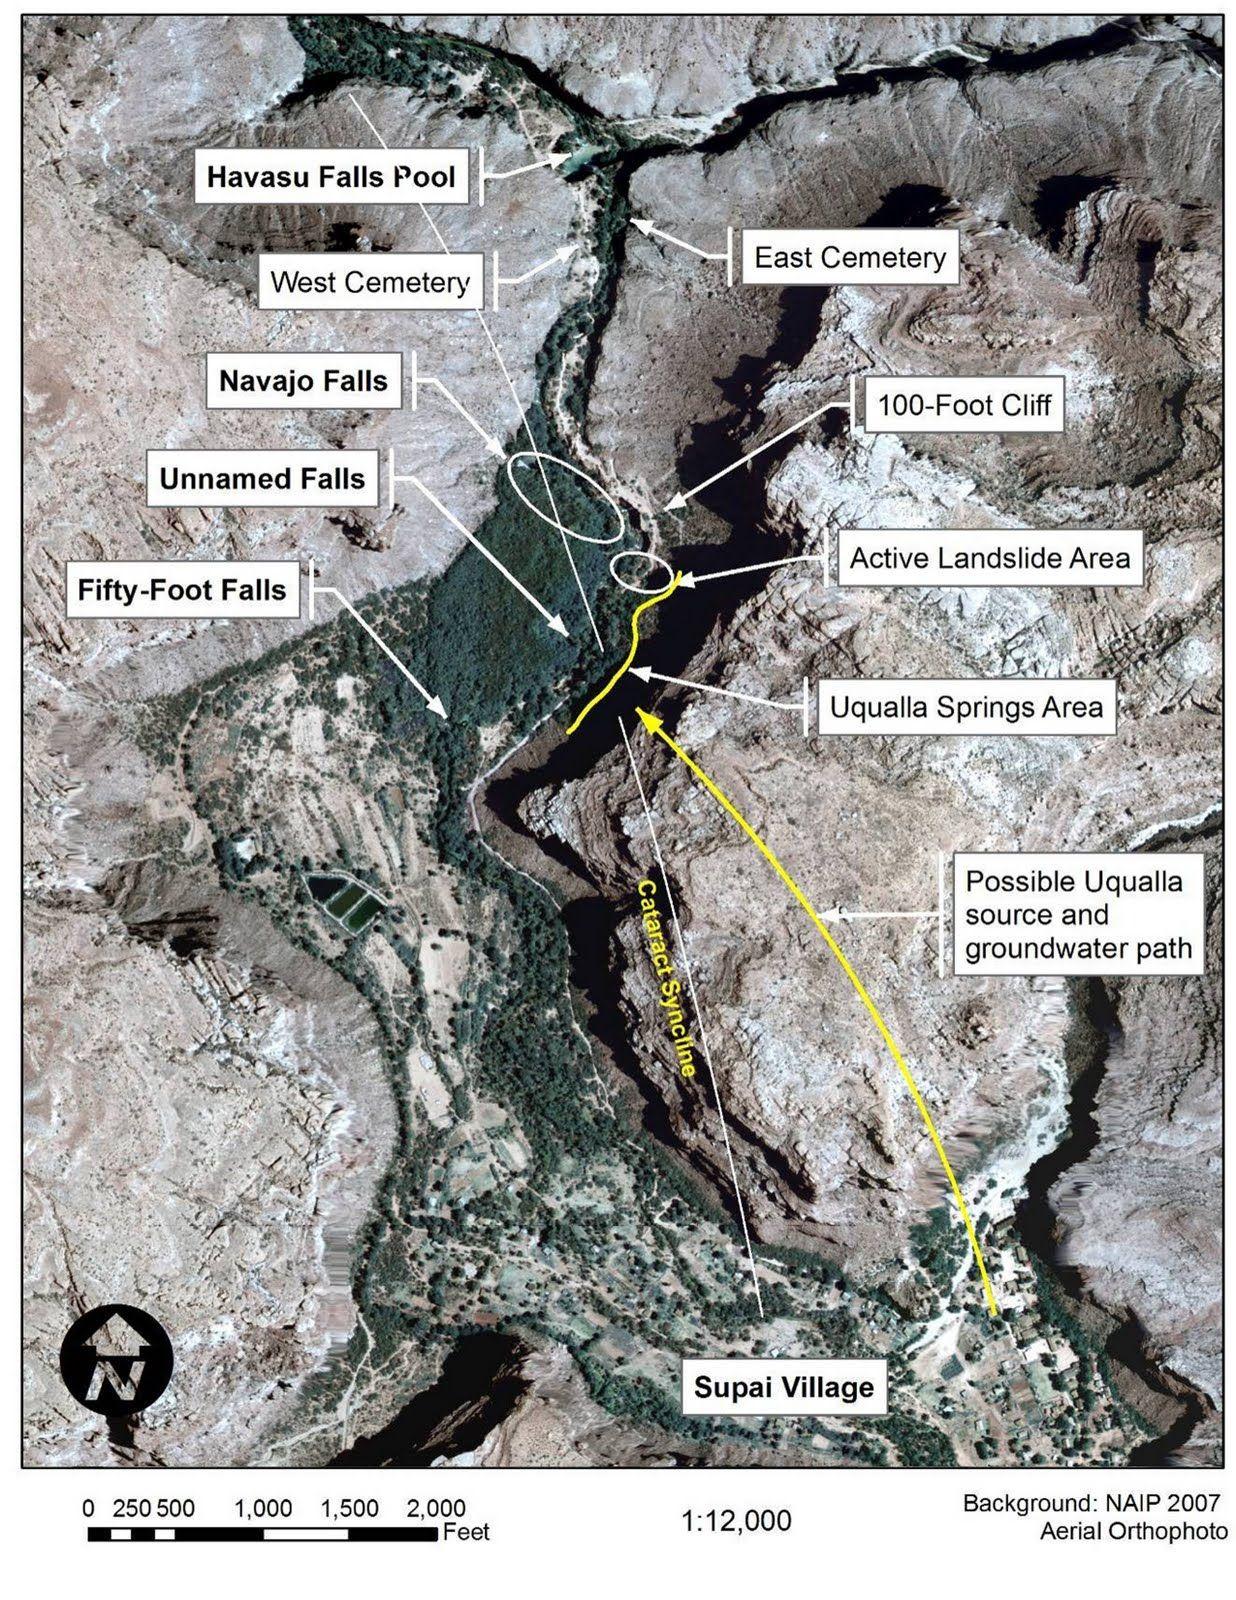 Havasu Falls Map Havasupai Falls Tours Directions | Havasupai Falls Map | Men's